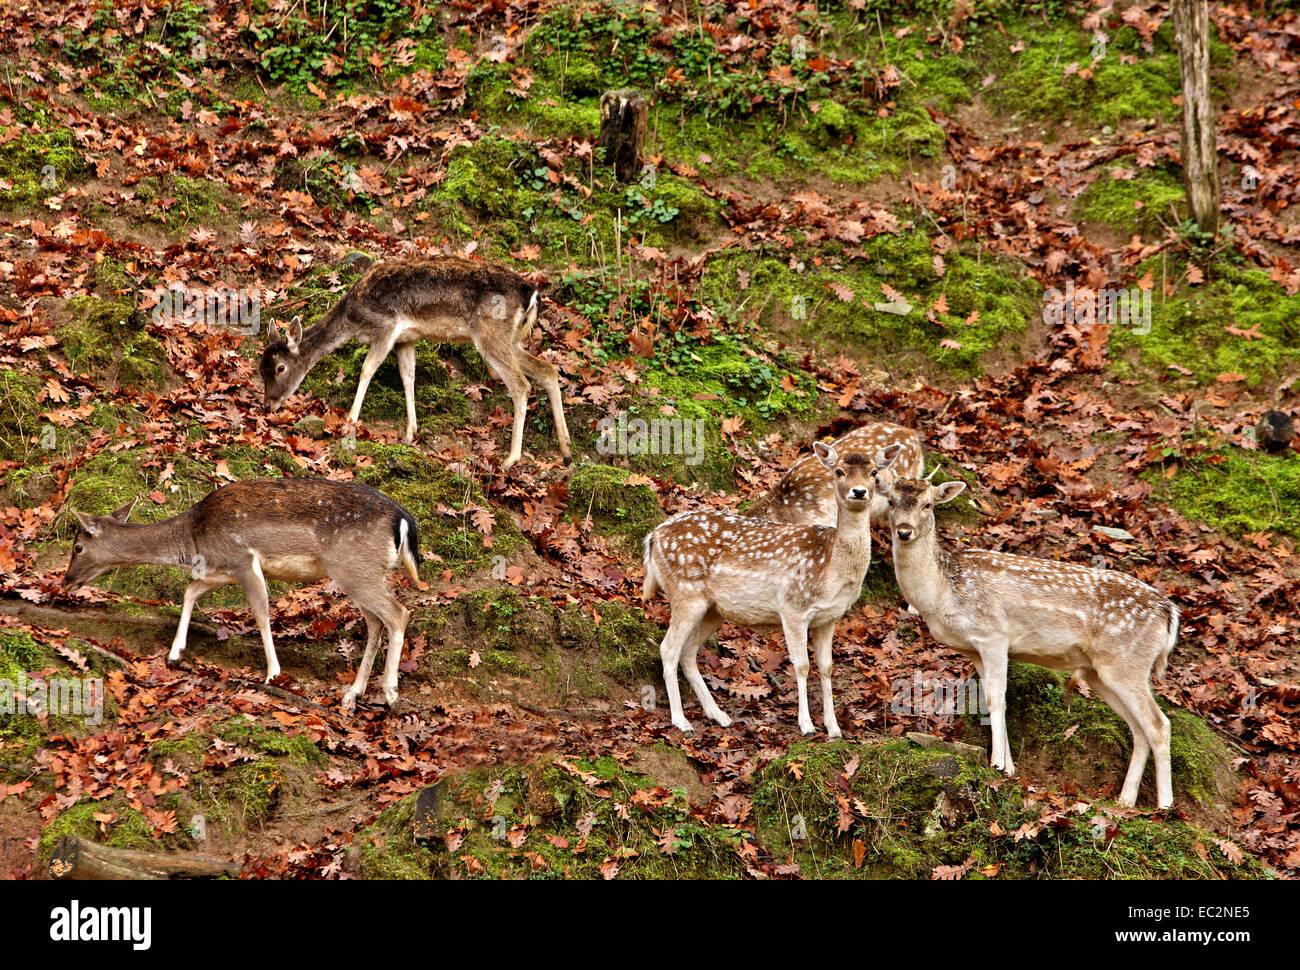 'Hide 'n' seek' with the deer on Titaros mountain, close to Aghios Demetrios village, Pieria, Macedonia, - Stock Image